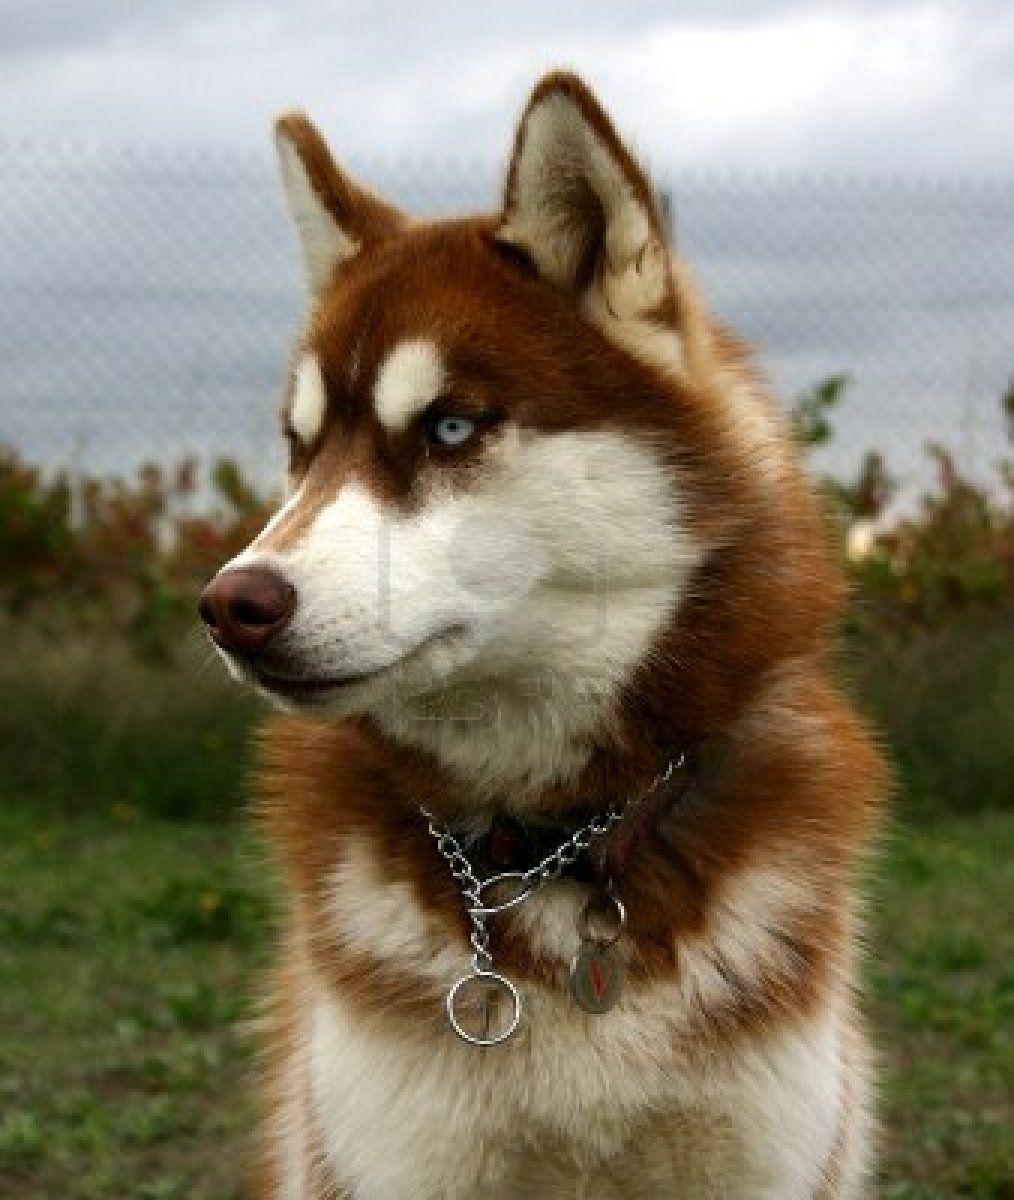 Siberian Huskies Beautifully Black White And Tan With Brown Eyes